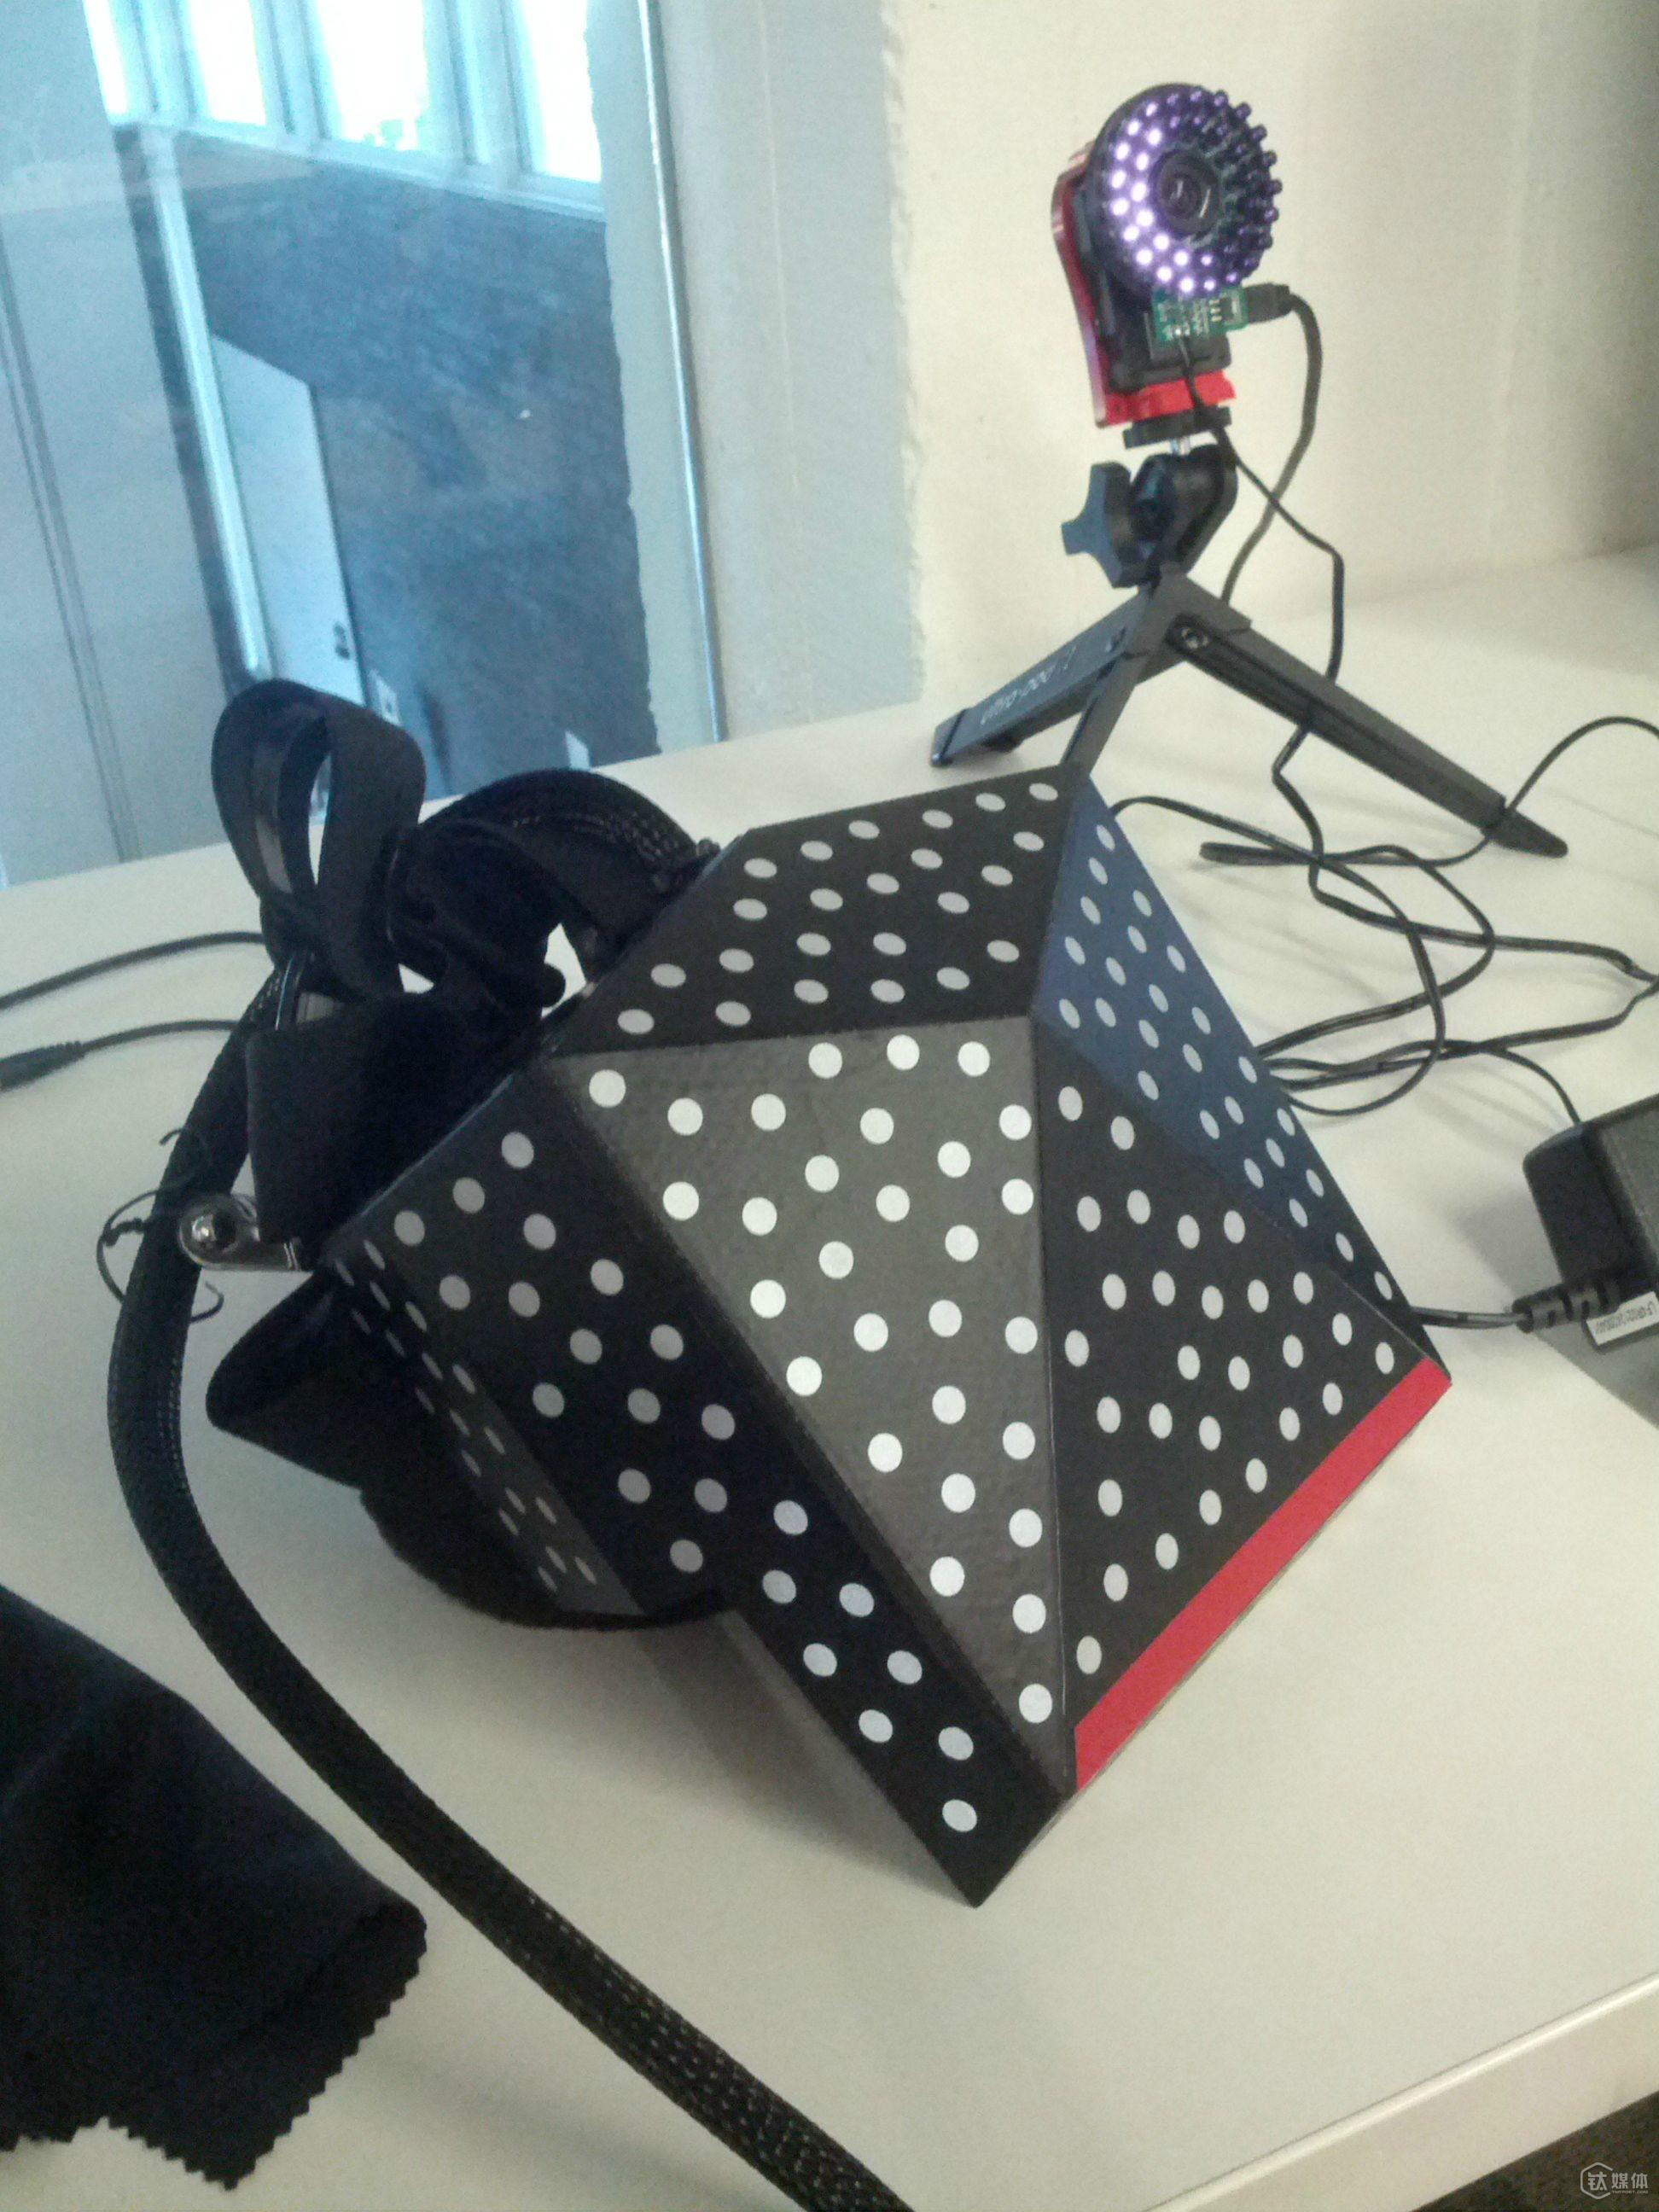 Valve 首次露面的 VR 产品 Reddit